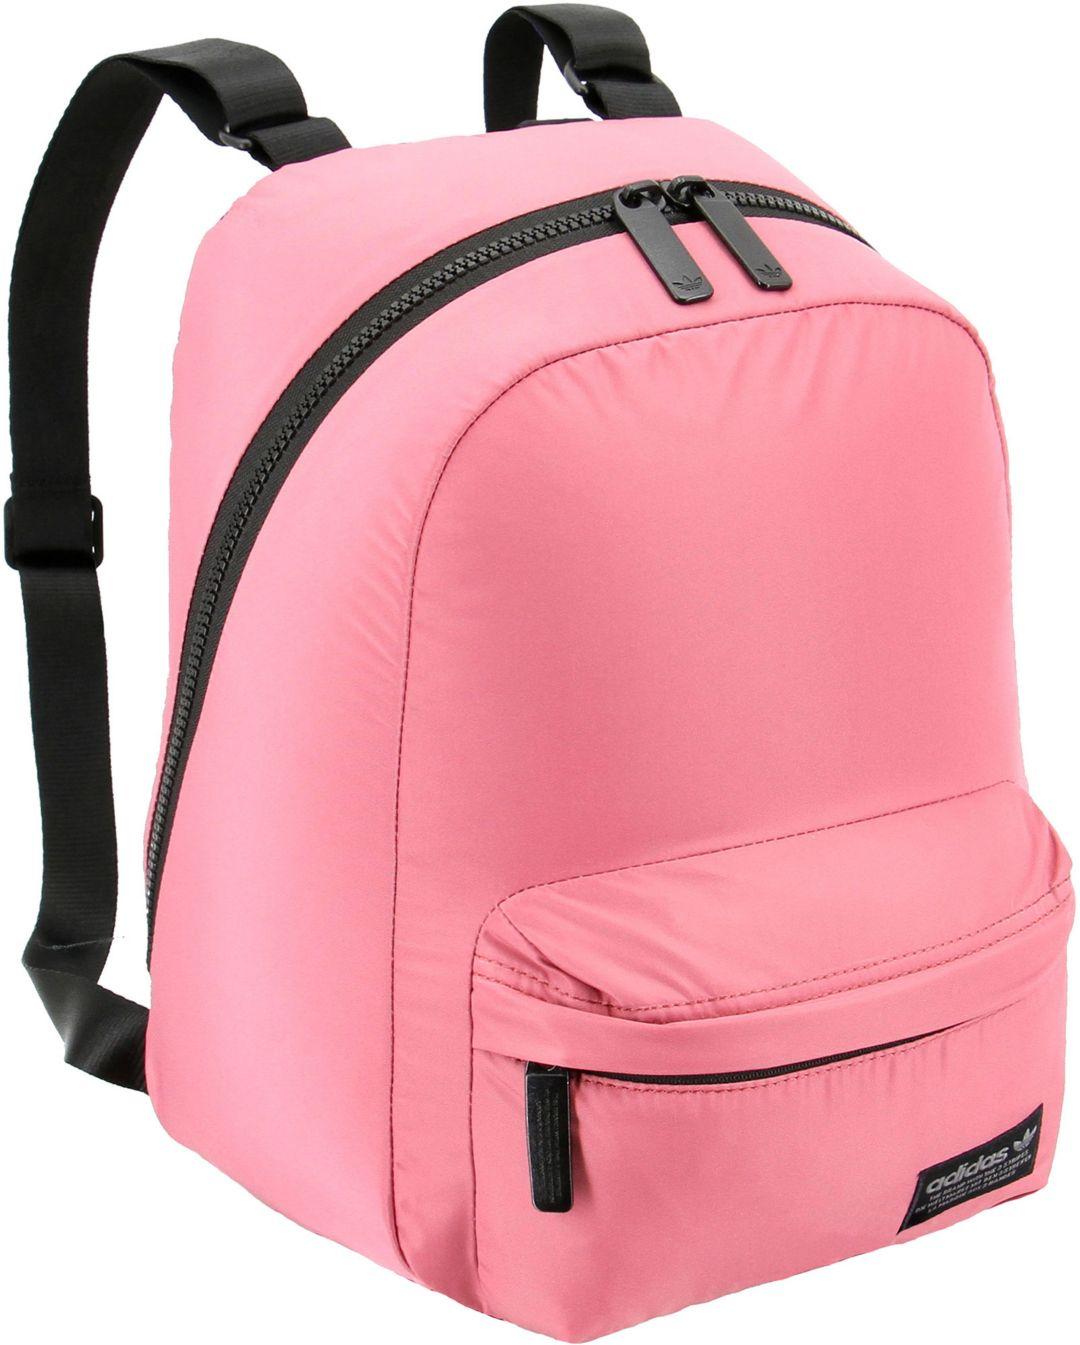 9d8dddc6befb adidas Originals Women's National Compact Backpack | DICK'S Sporting ...